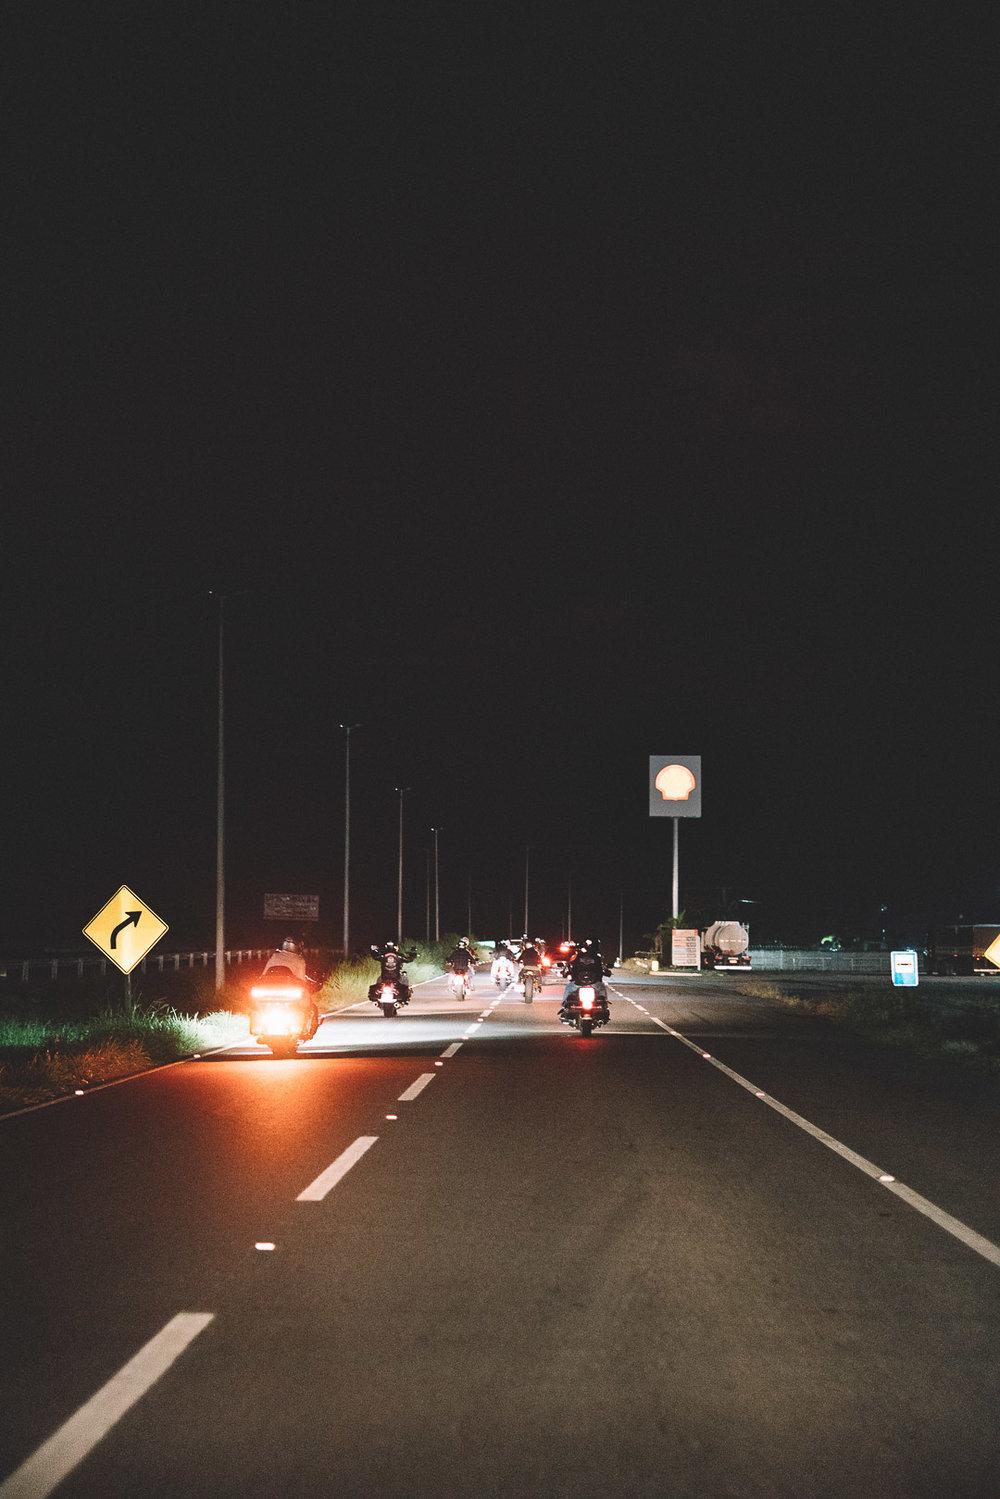 Harley Davidson Estrada noite